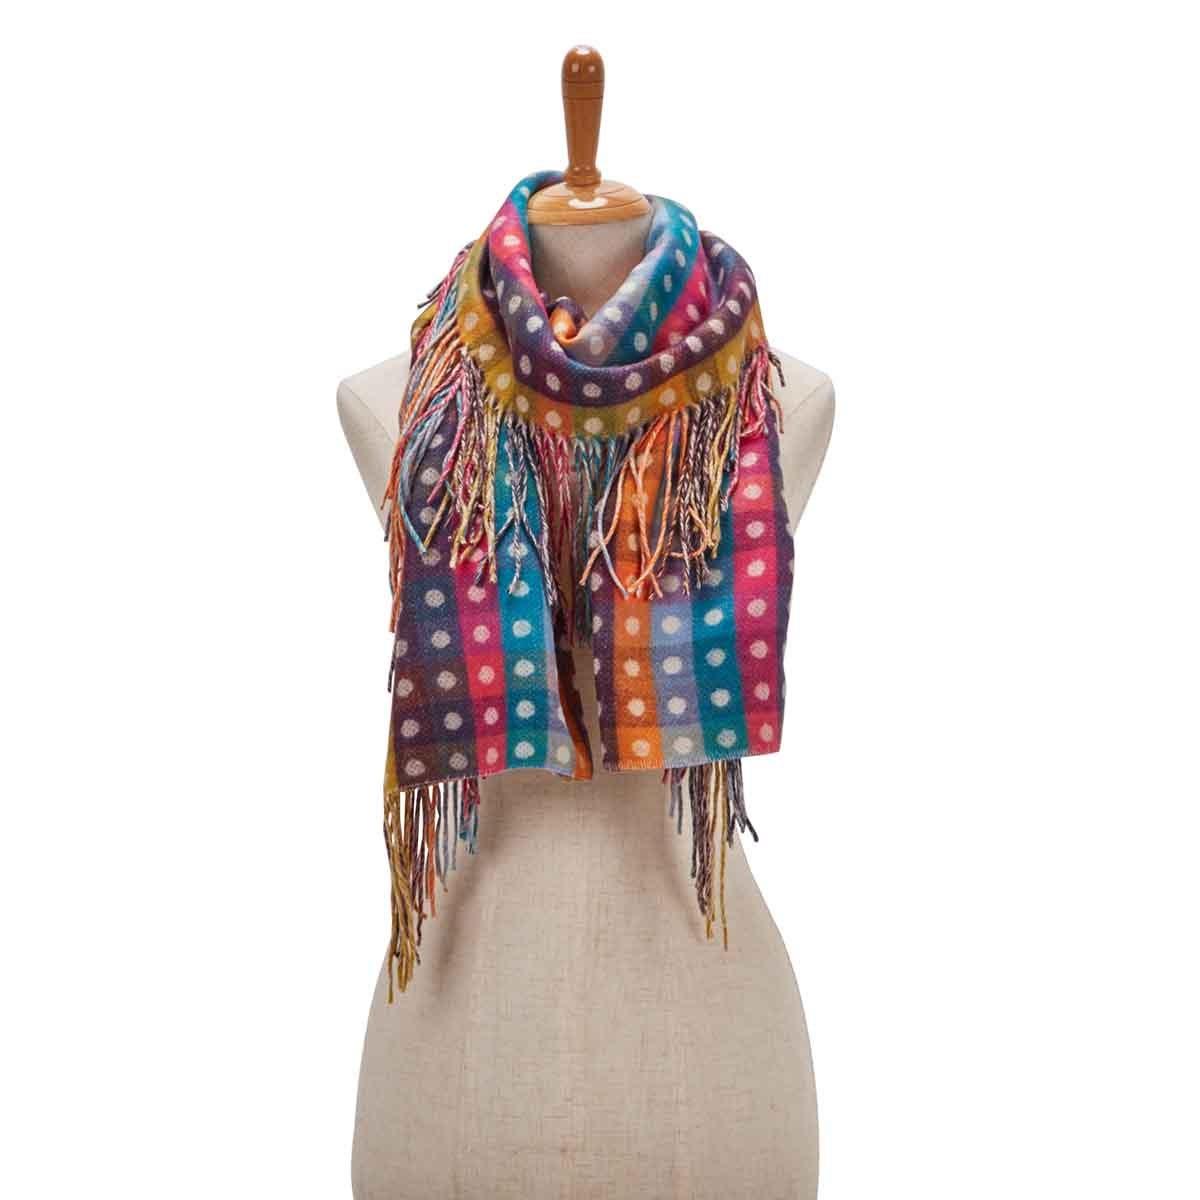 Women's SIDE FRINGE COLOR BLOCK multi scarf